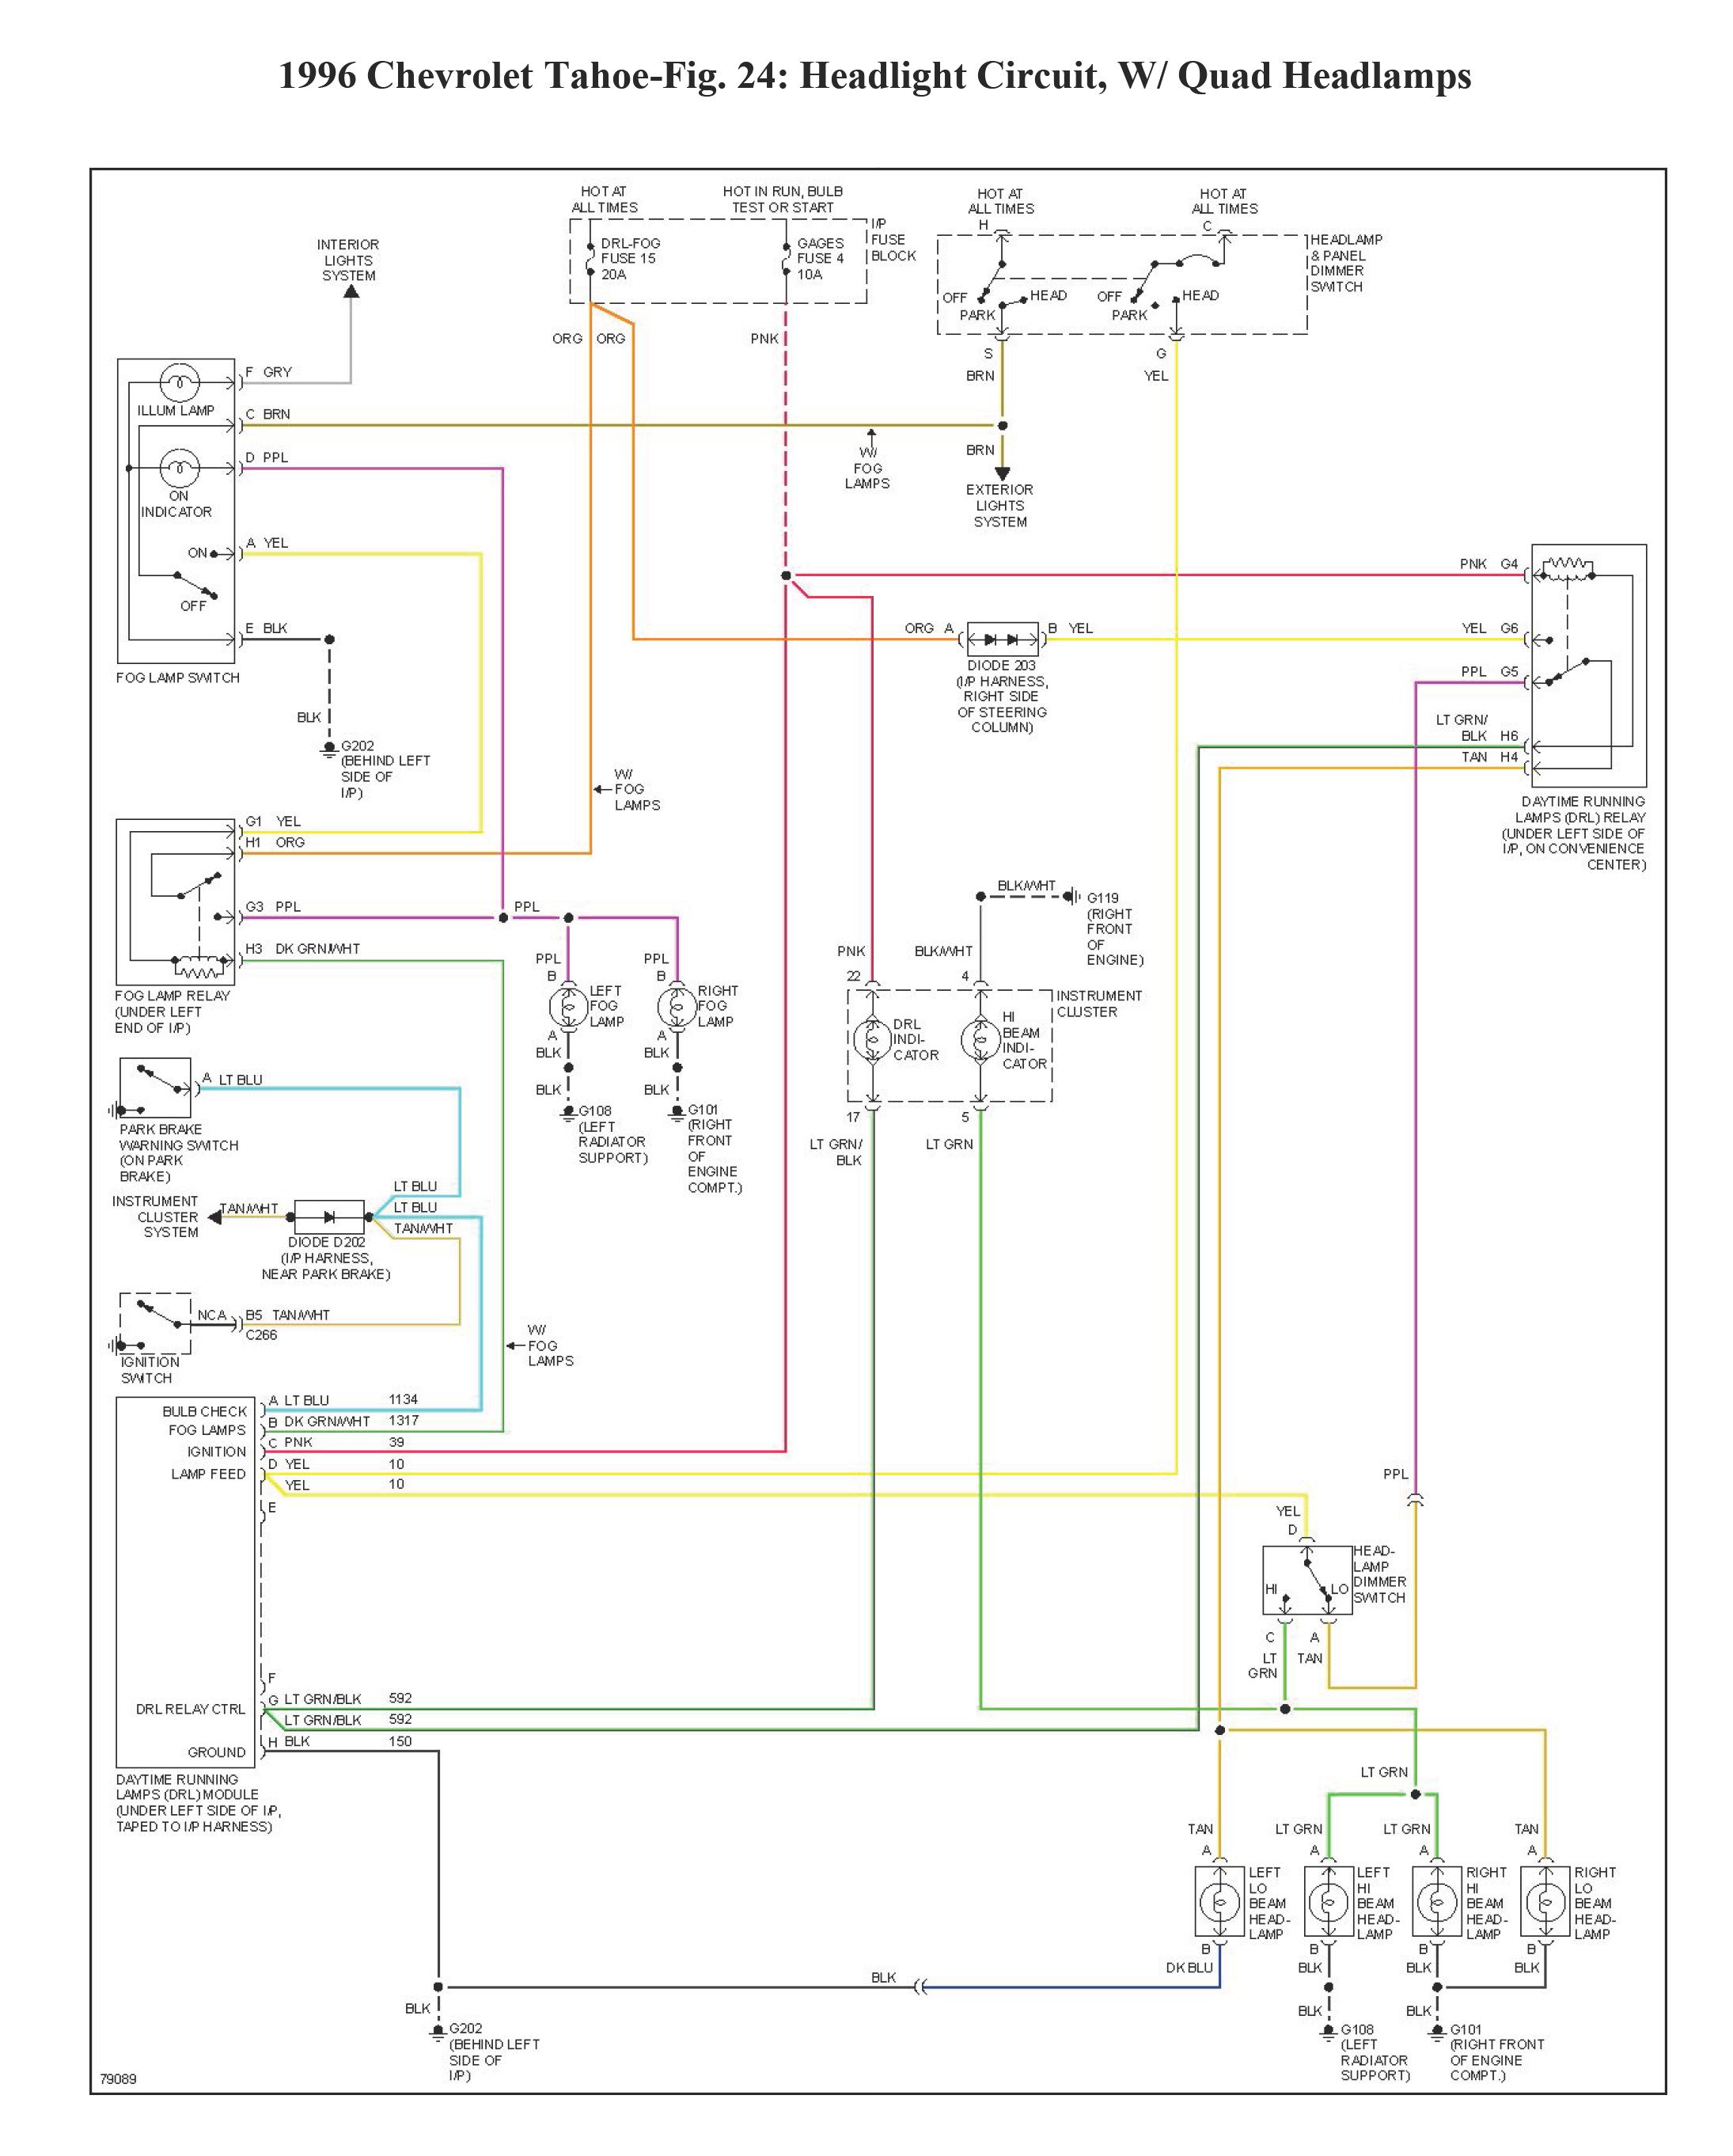 Boss Snow Plow Light Wiring Diagram - Rj45 Module Wiring Diagram - wire -diag.sarange.warmi.fr | Chevy 1500 Western Unimount Wiring Diagram |  | Wiring Diagram Resource